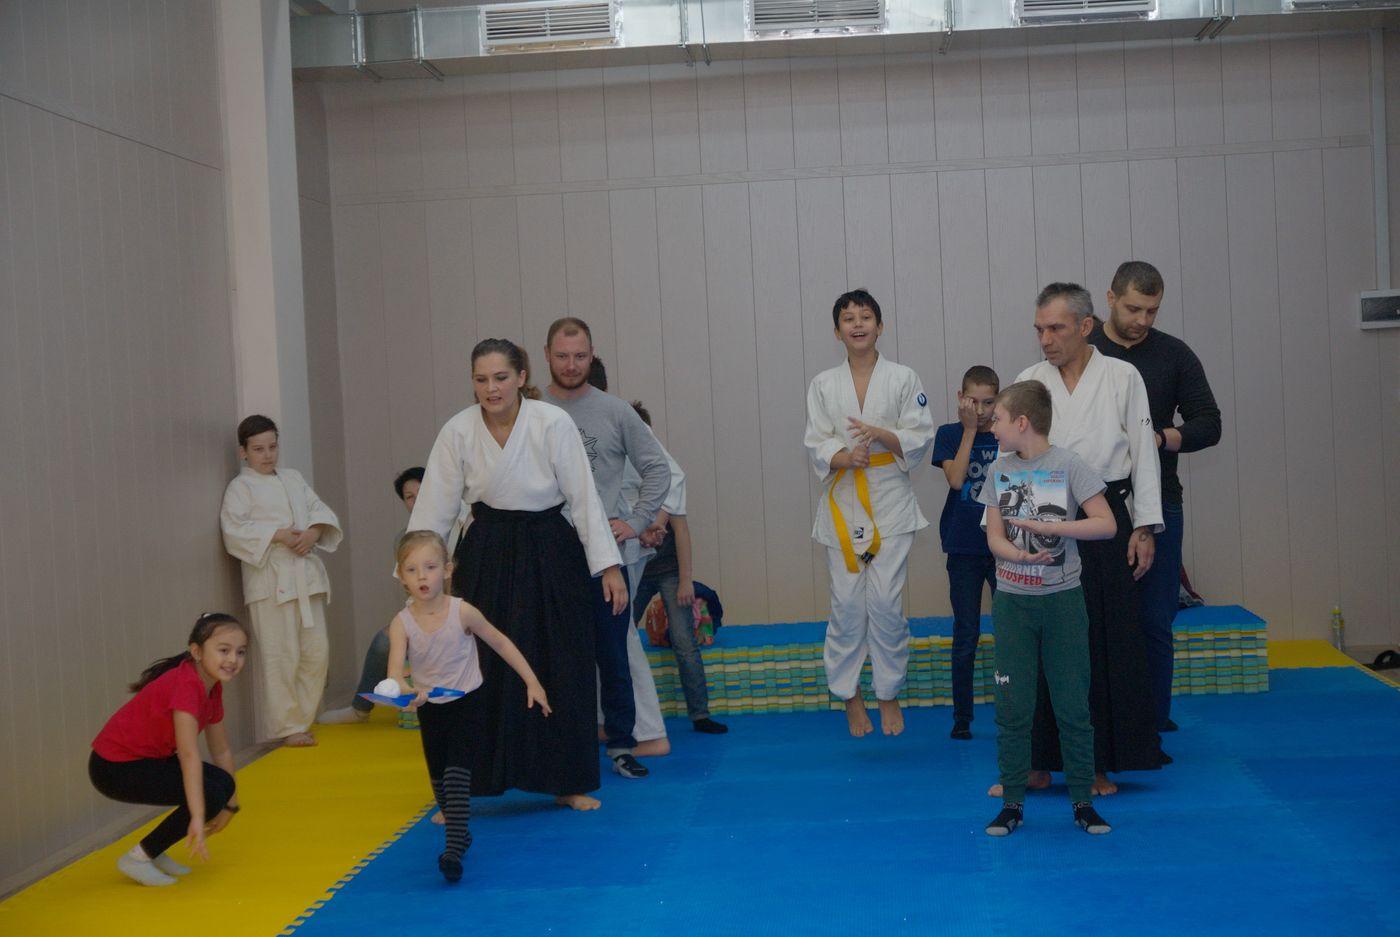 Открытие клуба в Дмитрове